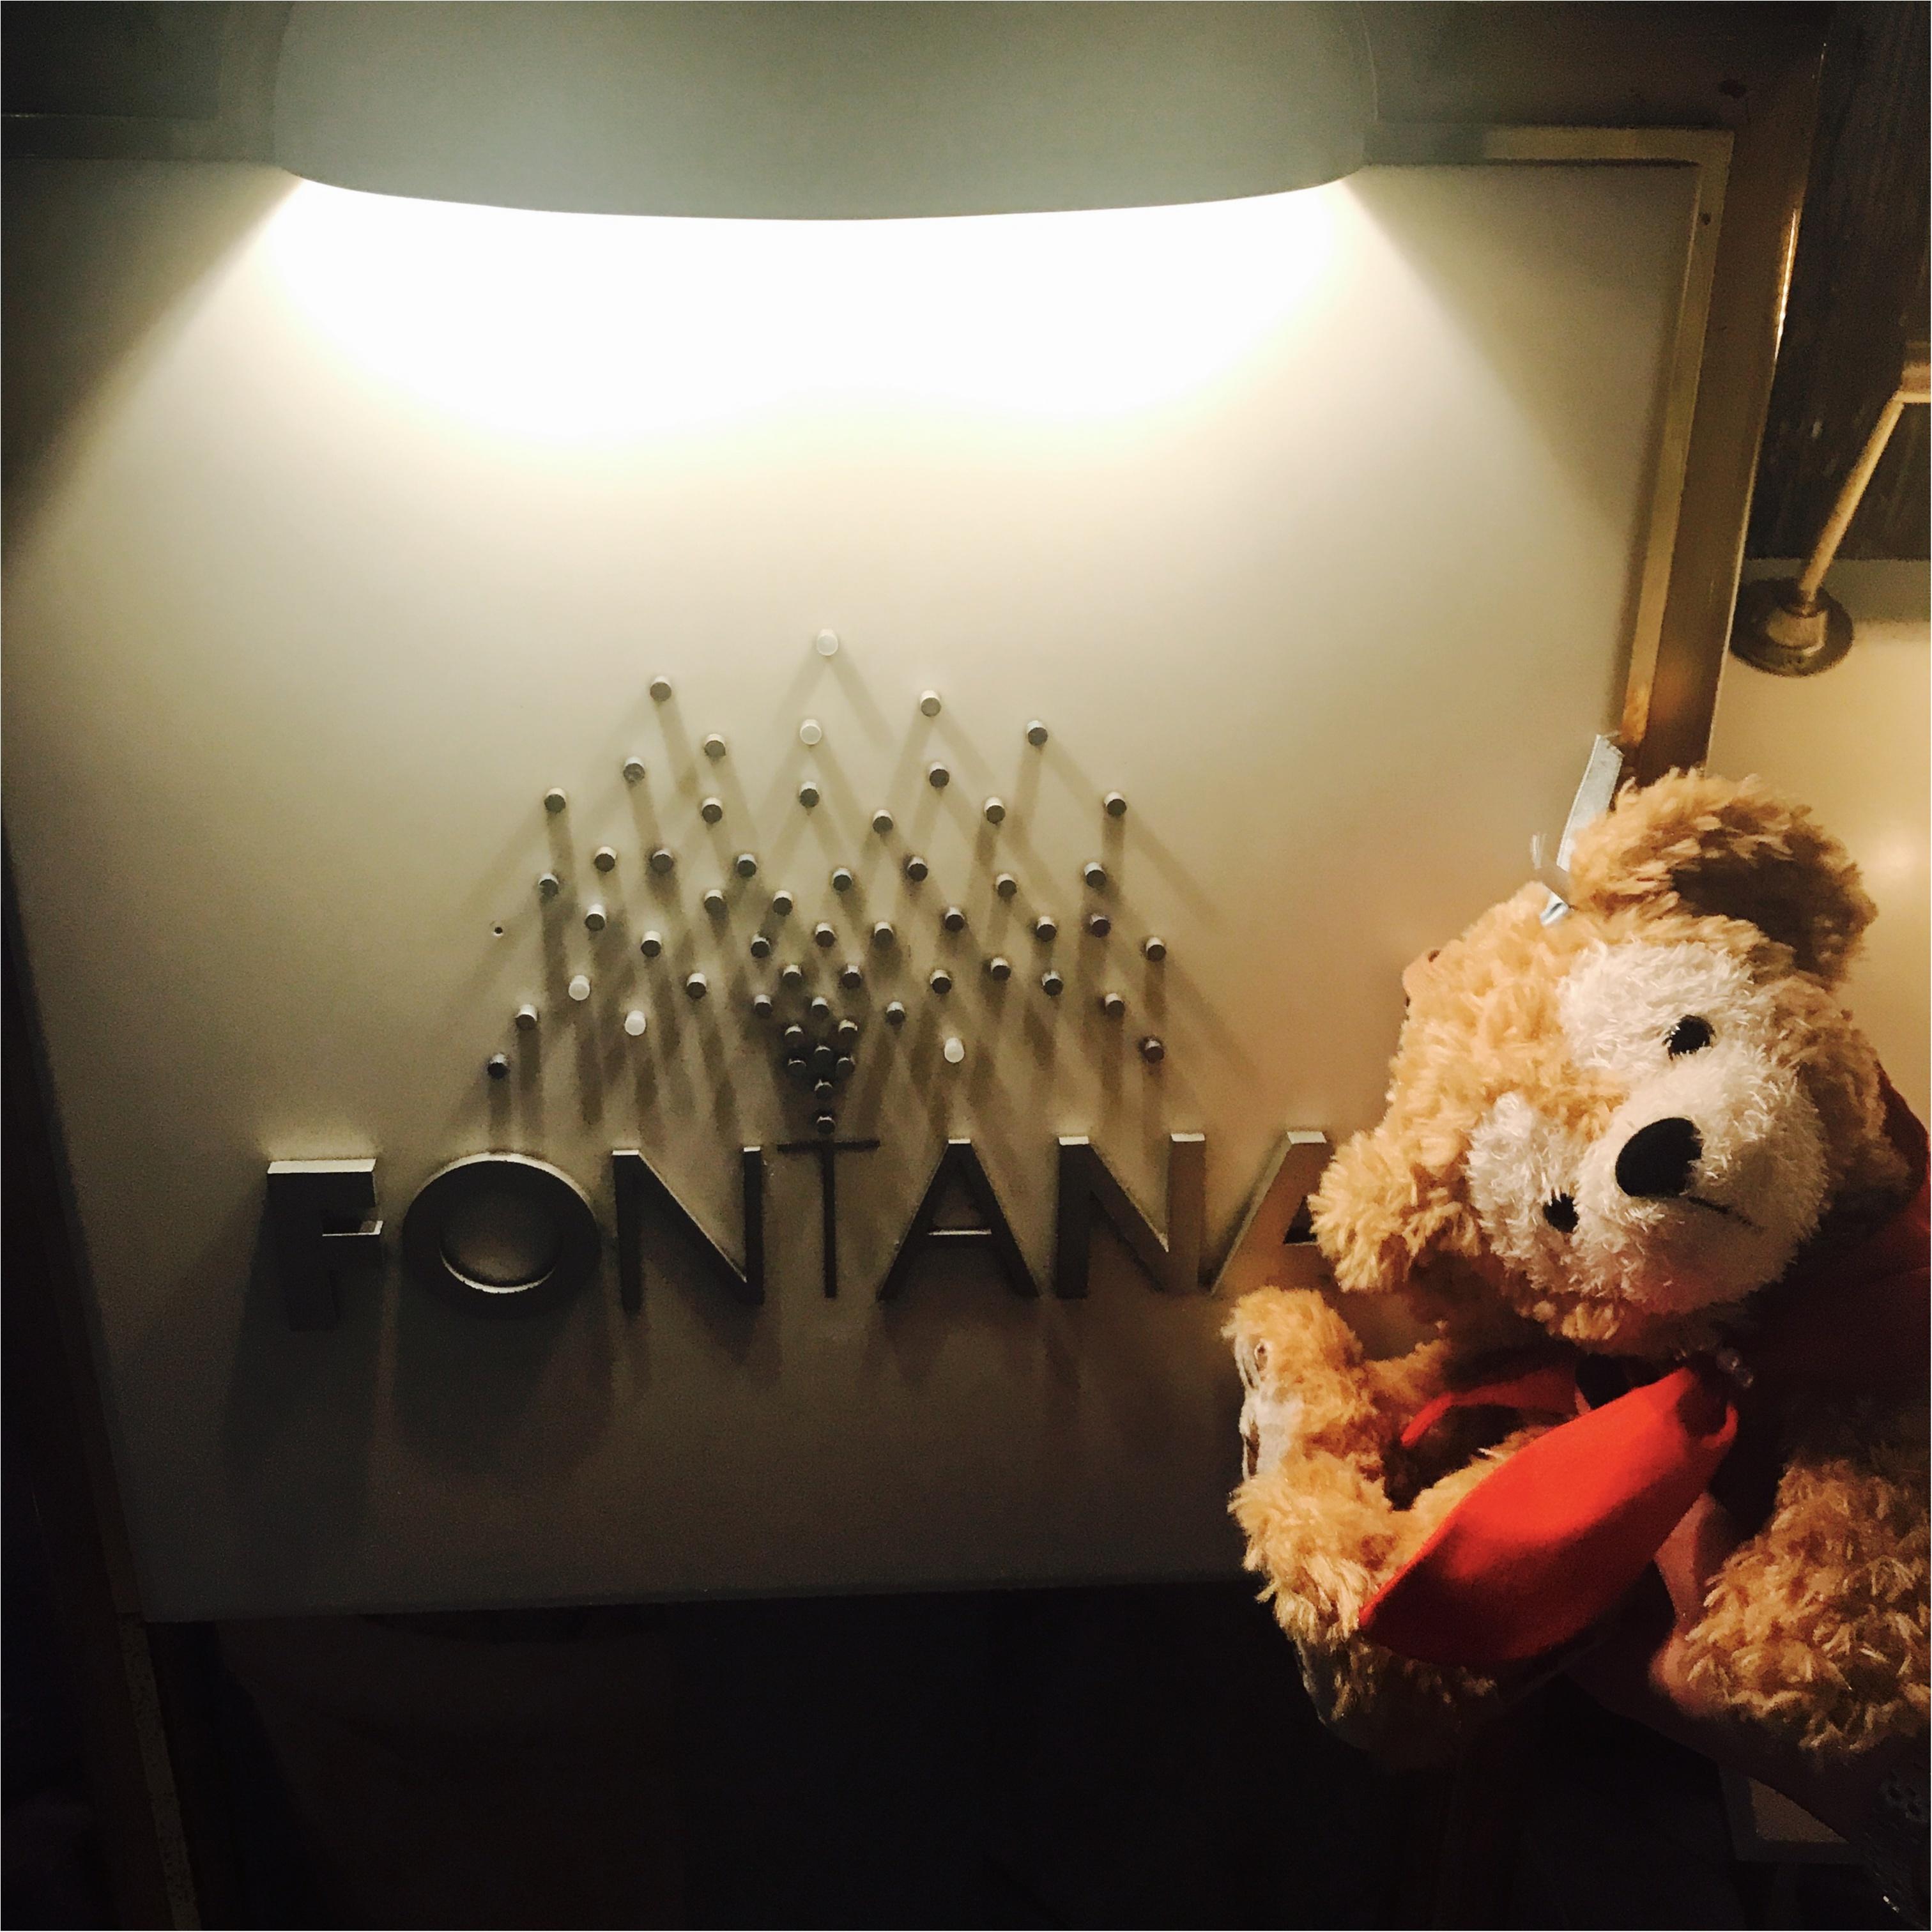 【FONTANA】ホテルオークラ東京ベイ 〜お泊まりディズニー①〜_2